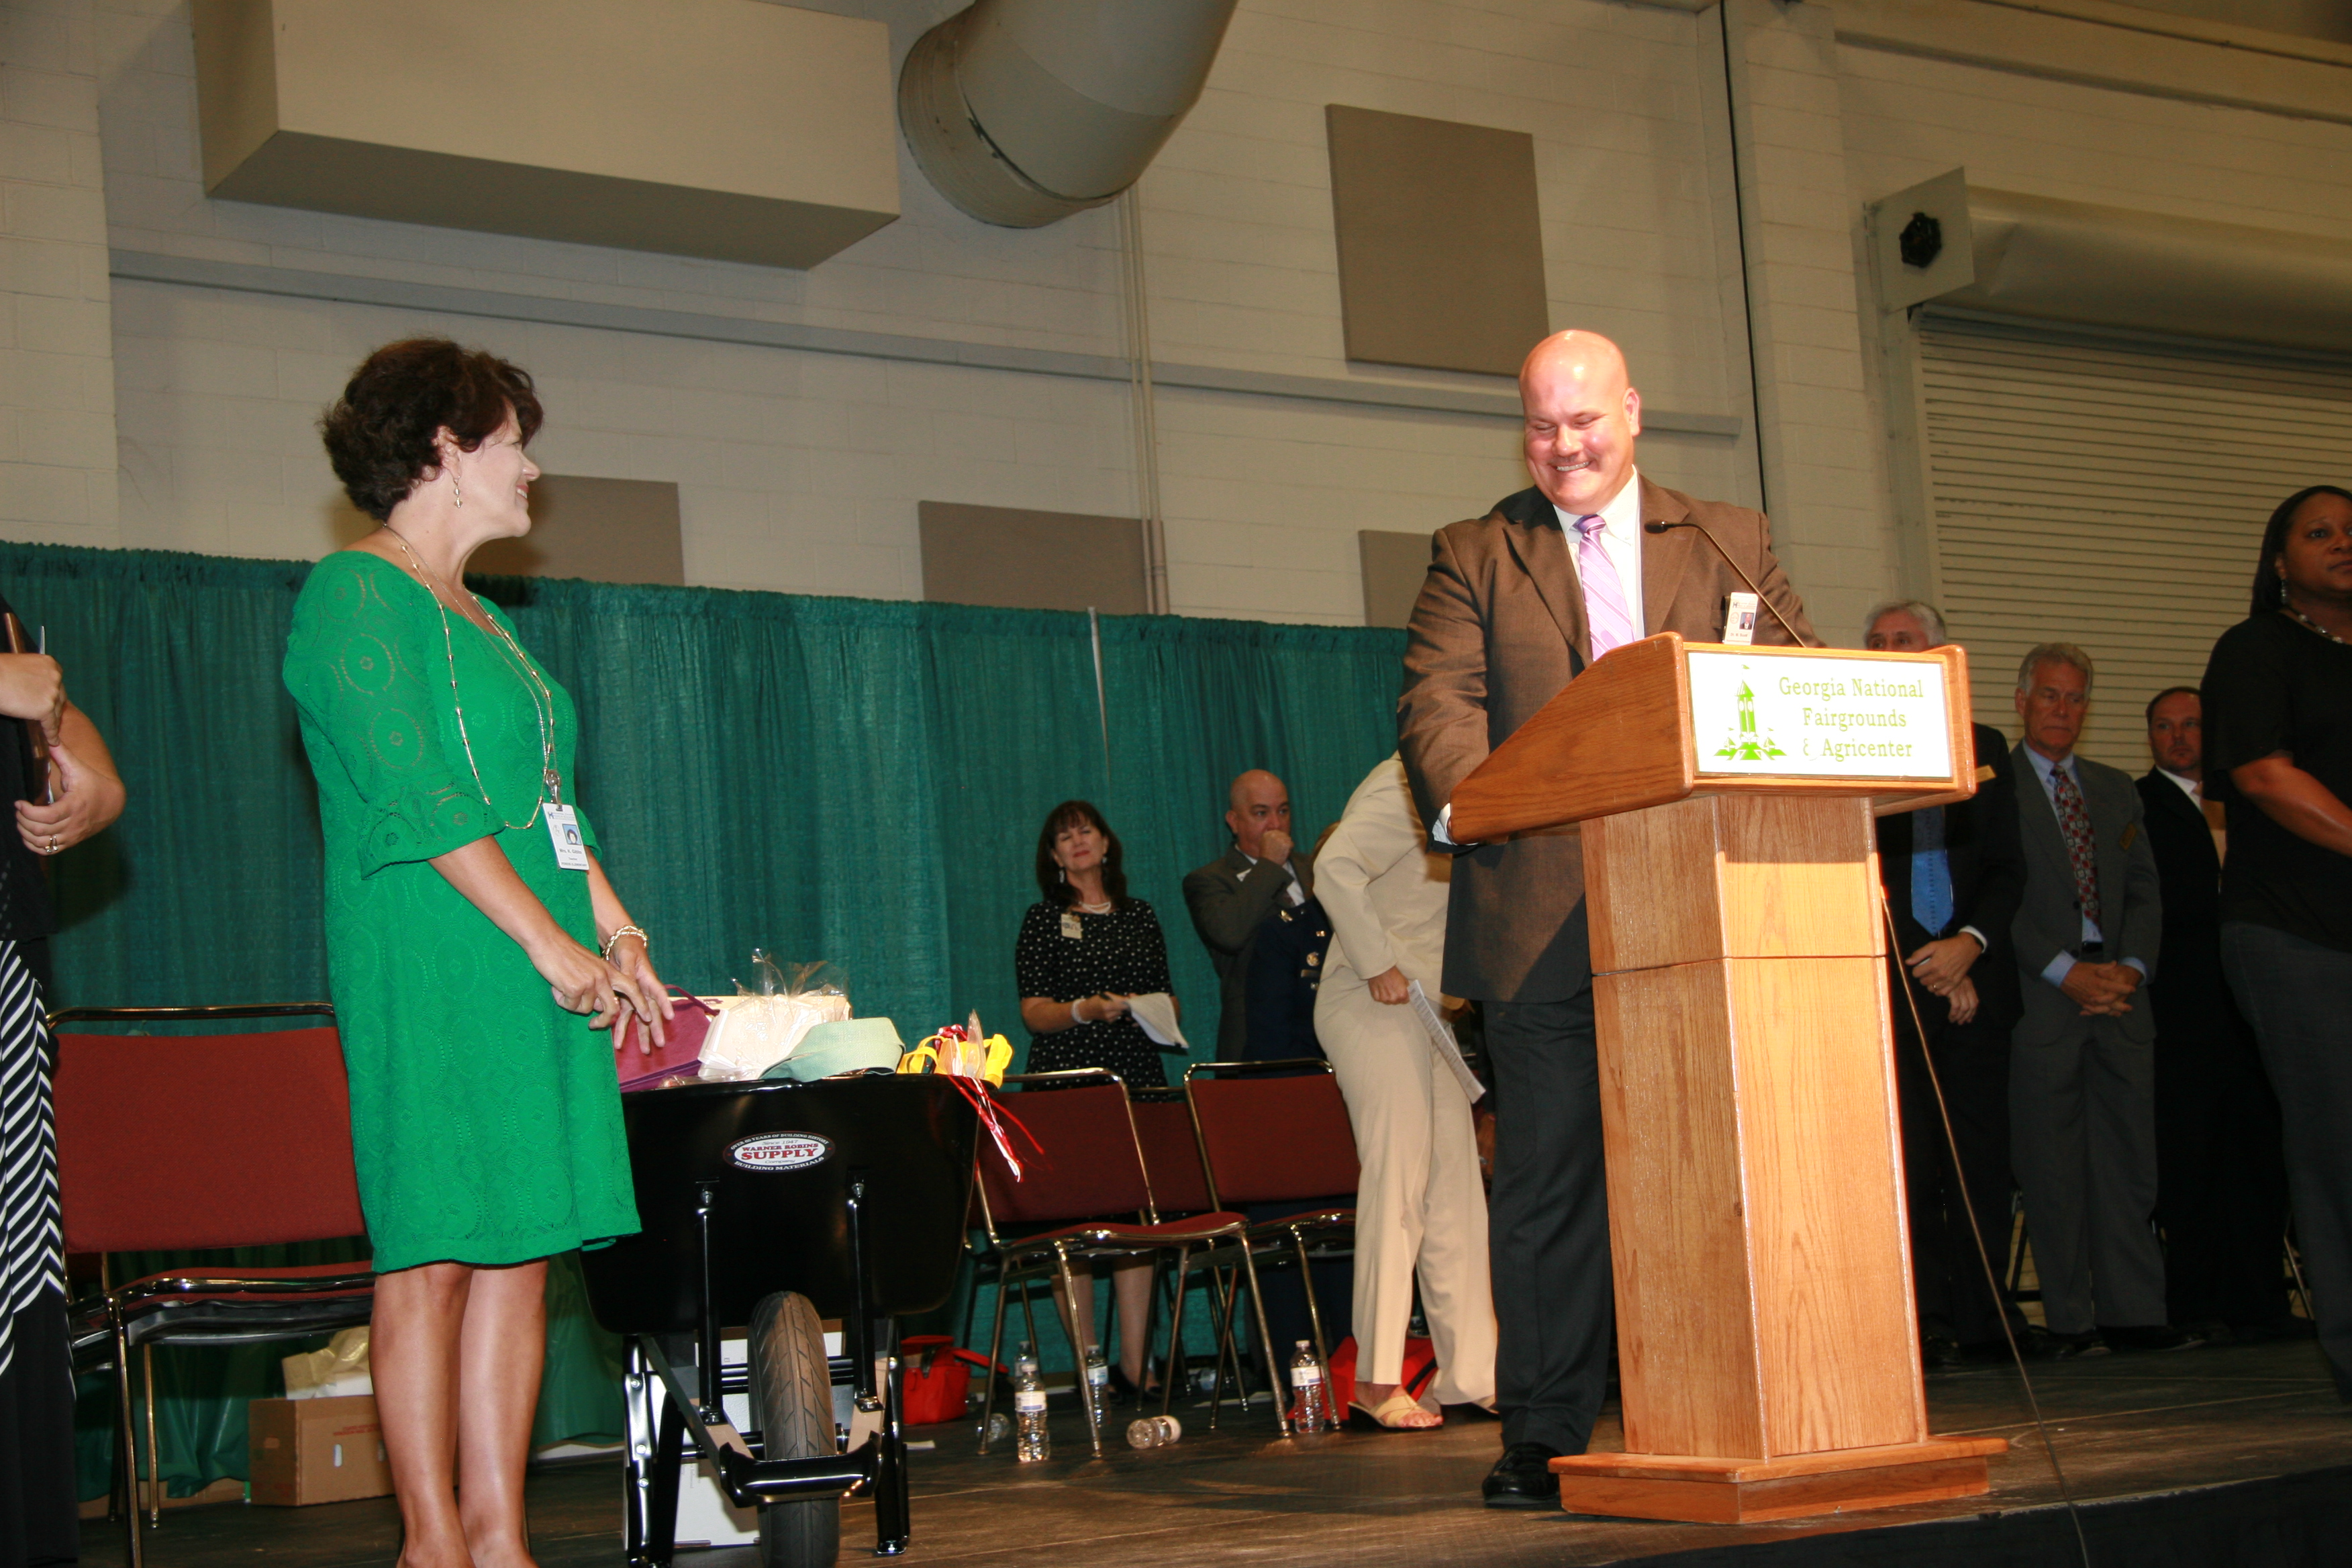 Superintendent of Schools Dr. Mark Scott congratulating Kathy Gibbs